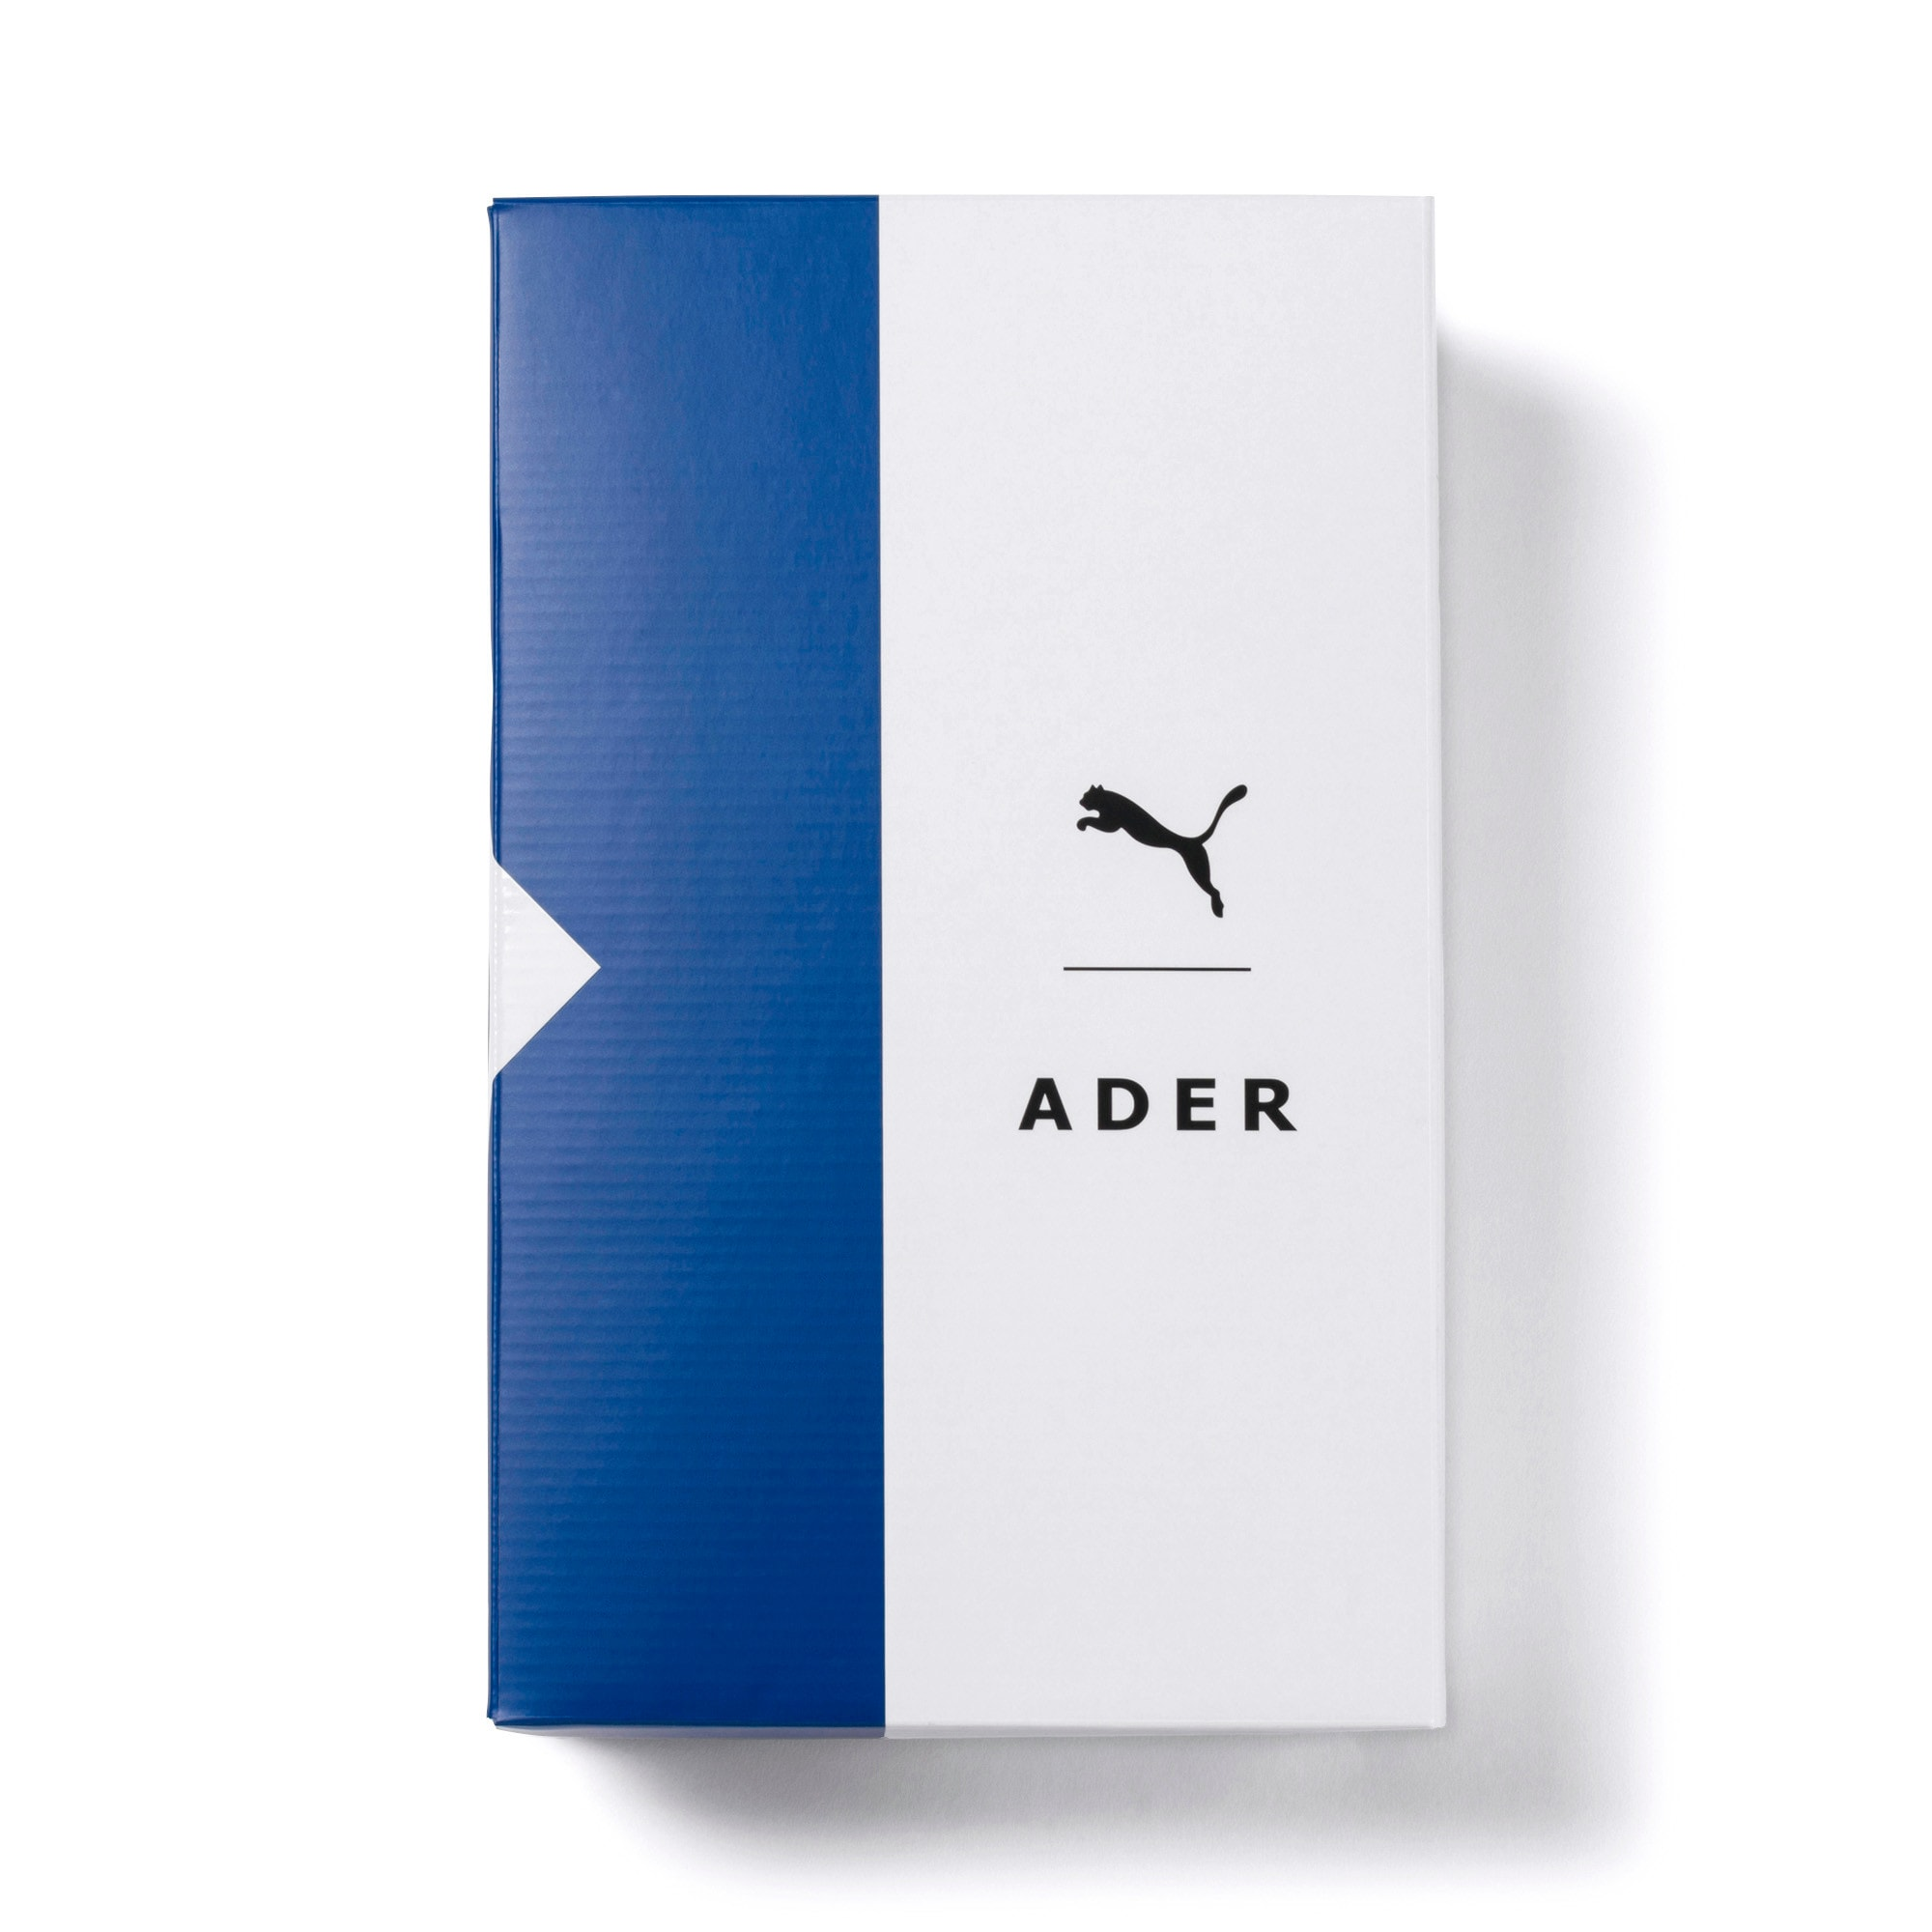 Thumbnail 4 of PUMA x ADER ERROR RS-0 Trainers, Lapis Blue, medium-IND